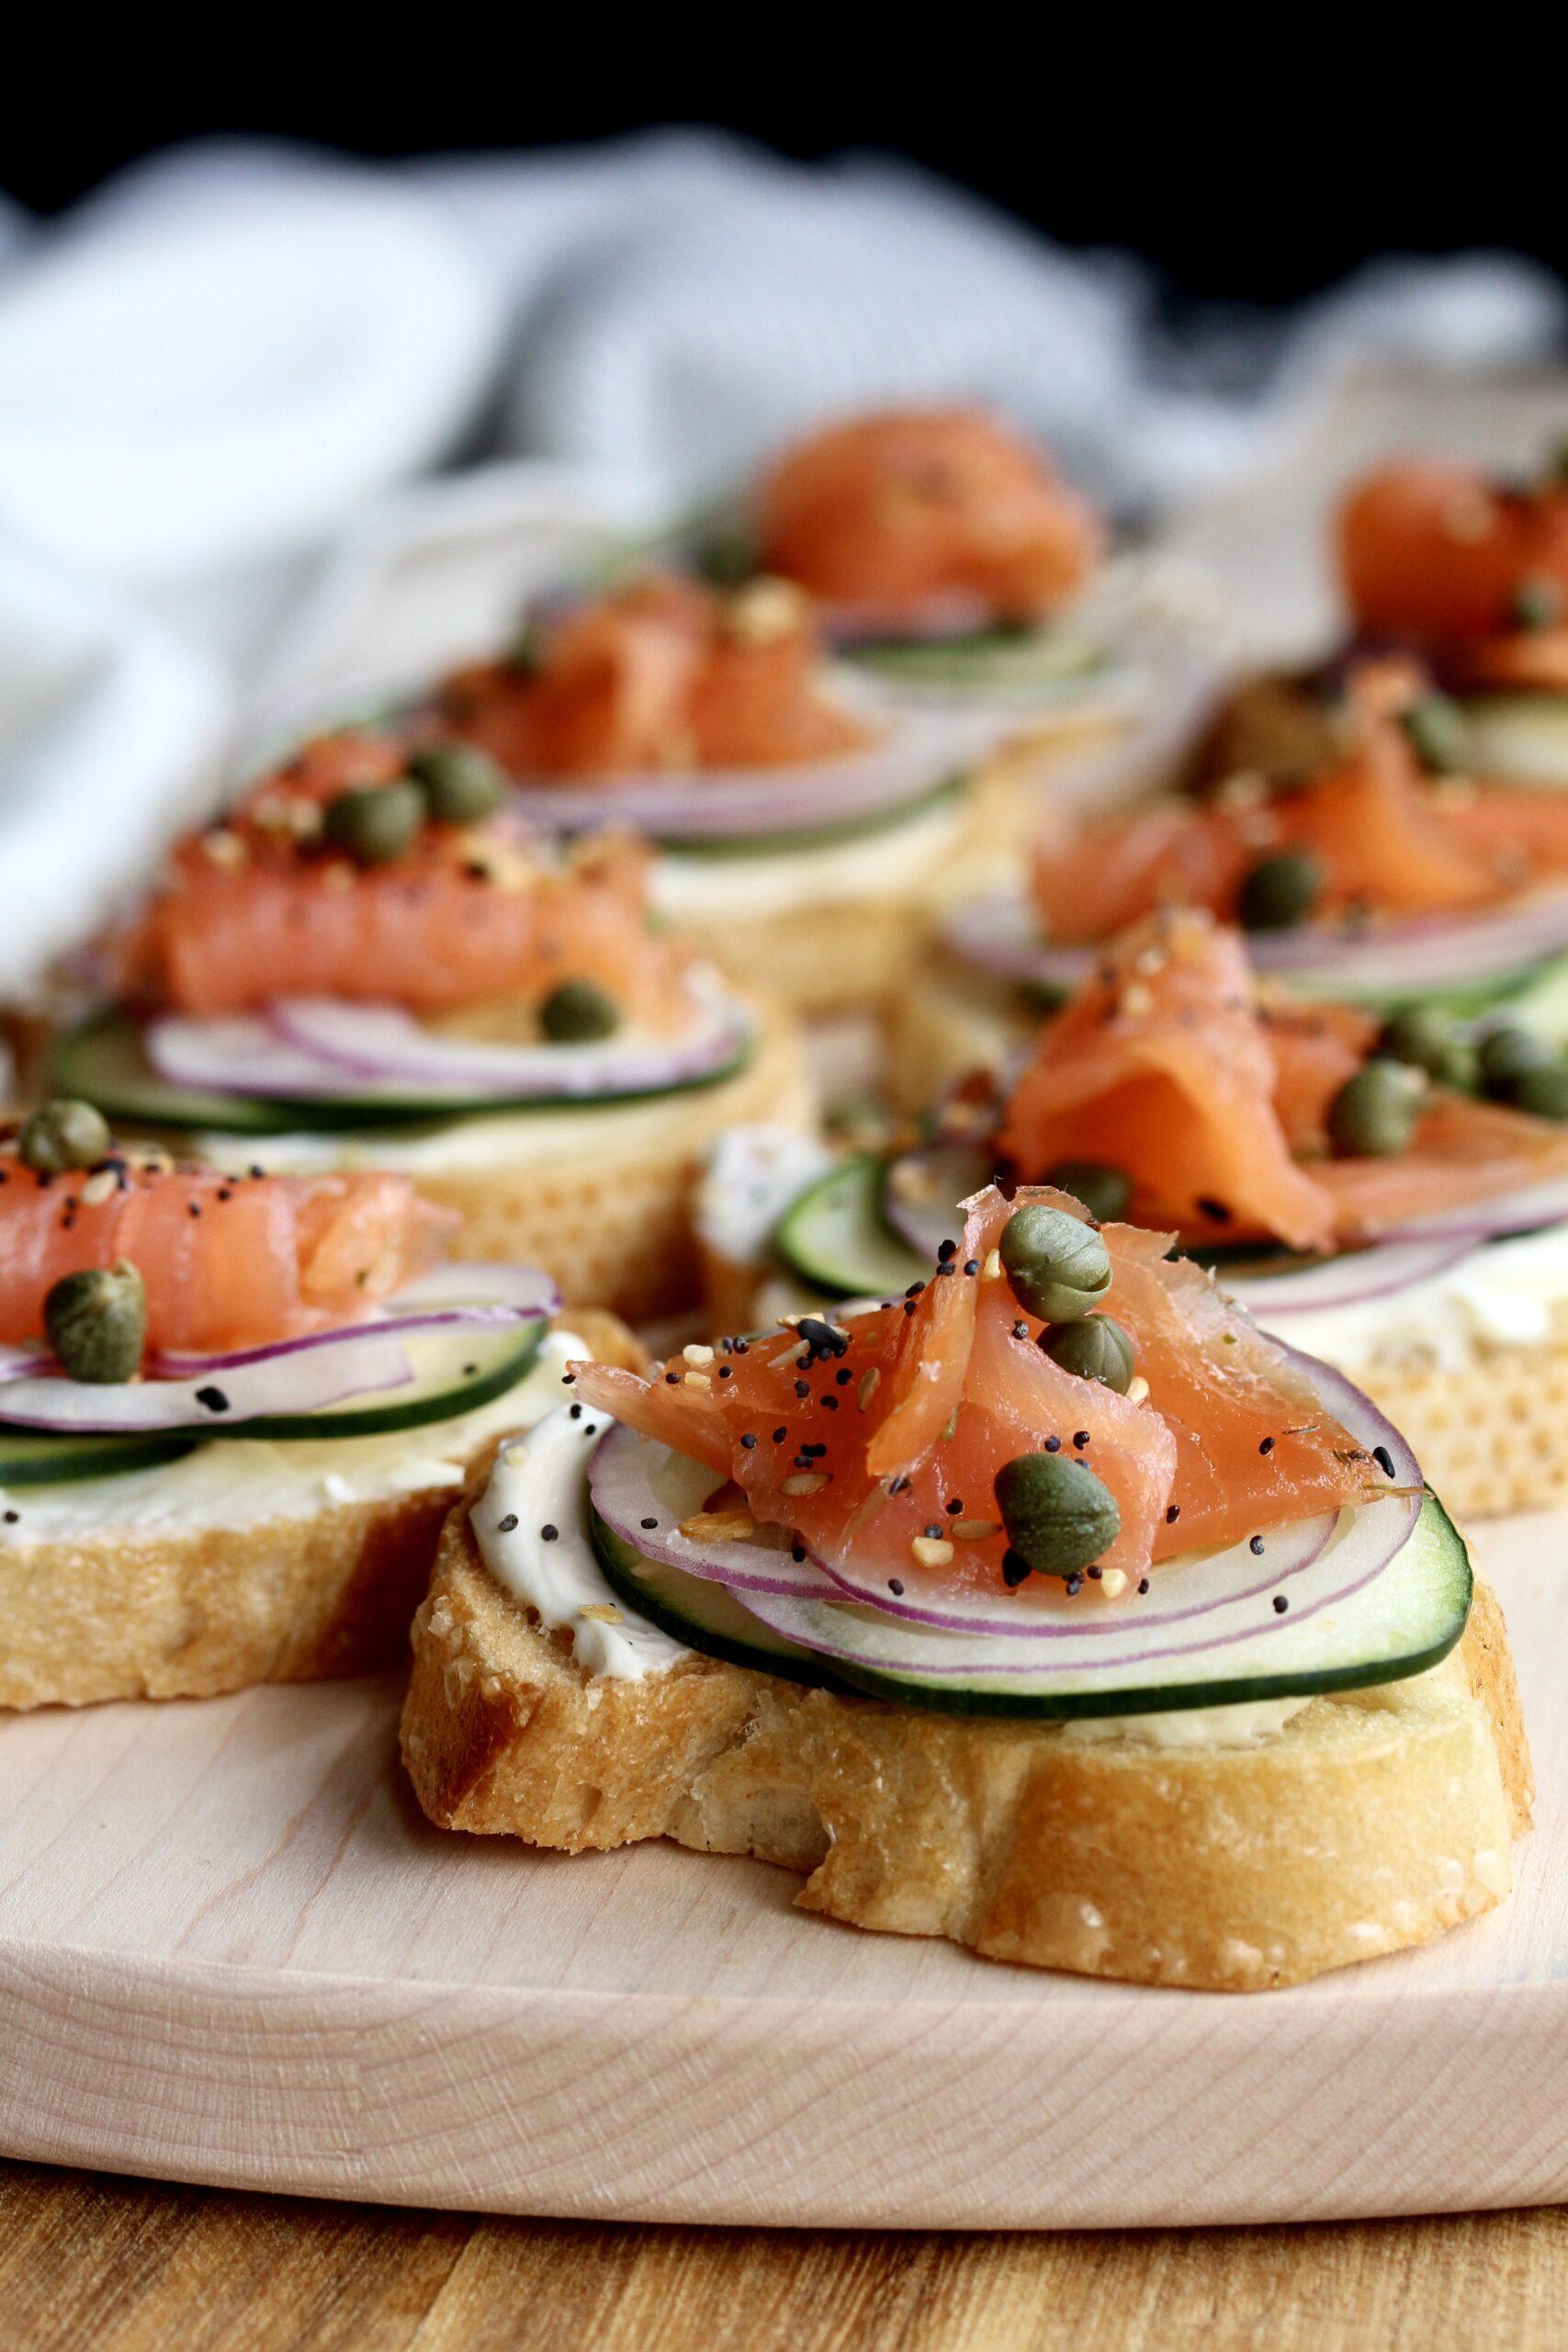 Everything Bagel Smoked Salmon Toasts | sarahaasrdn.com